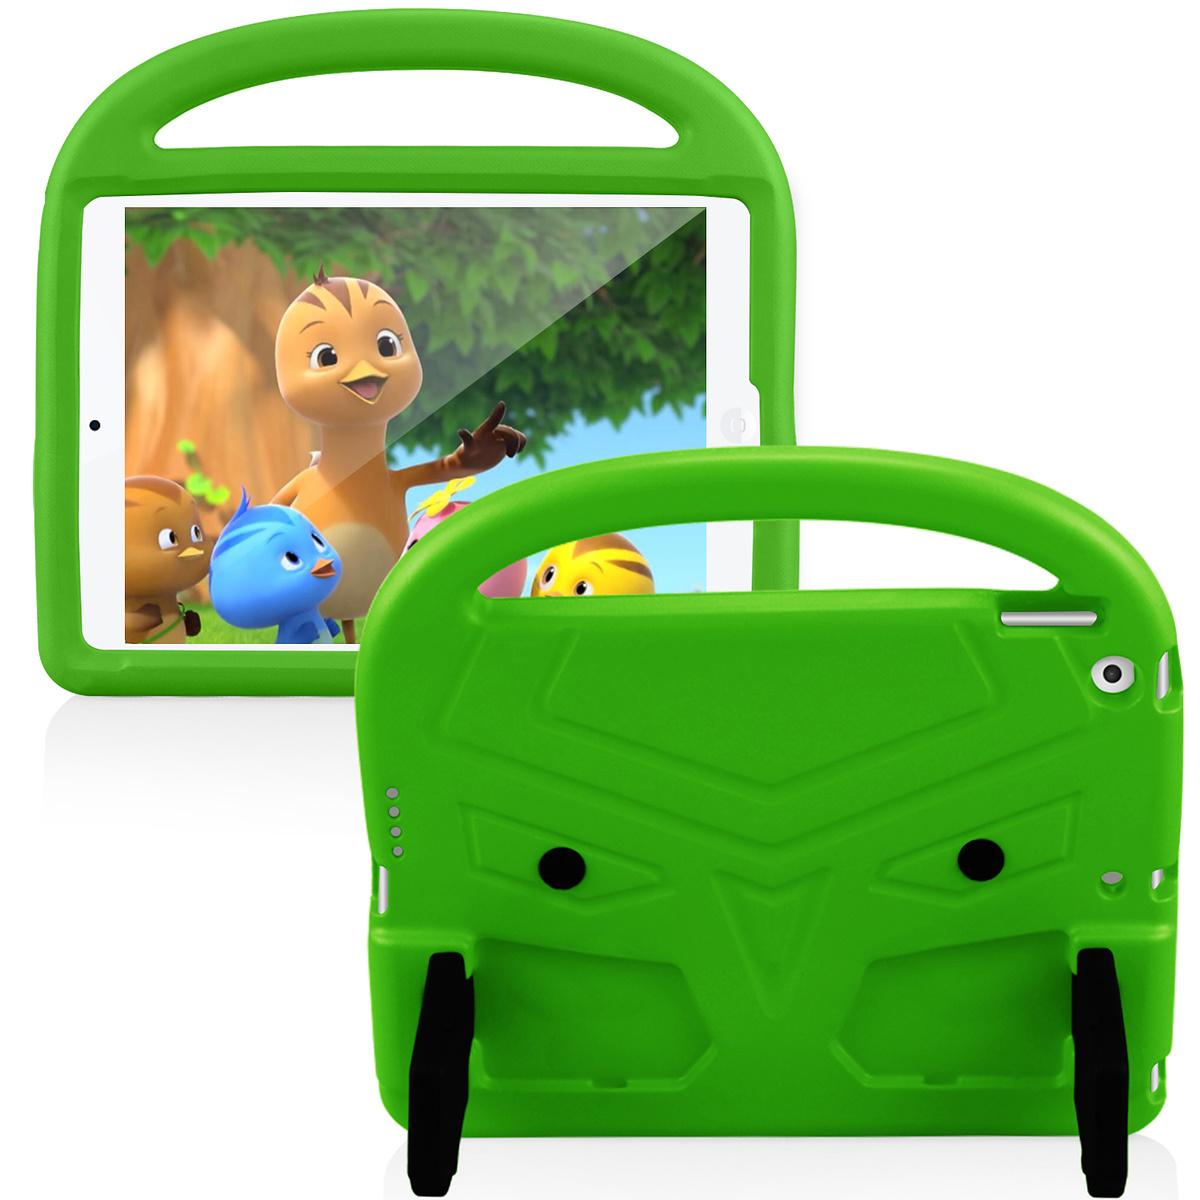 Barnfodral med ställ, iPad 10.2/10.5 iPad Air 3 (2019), grön